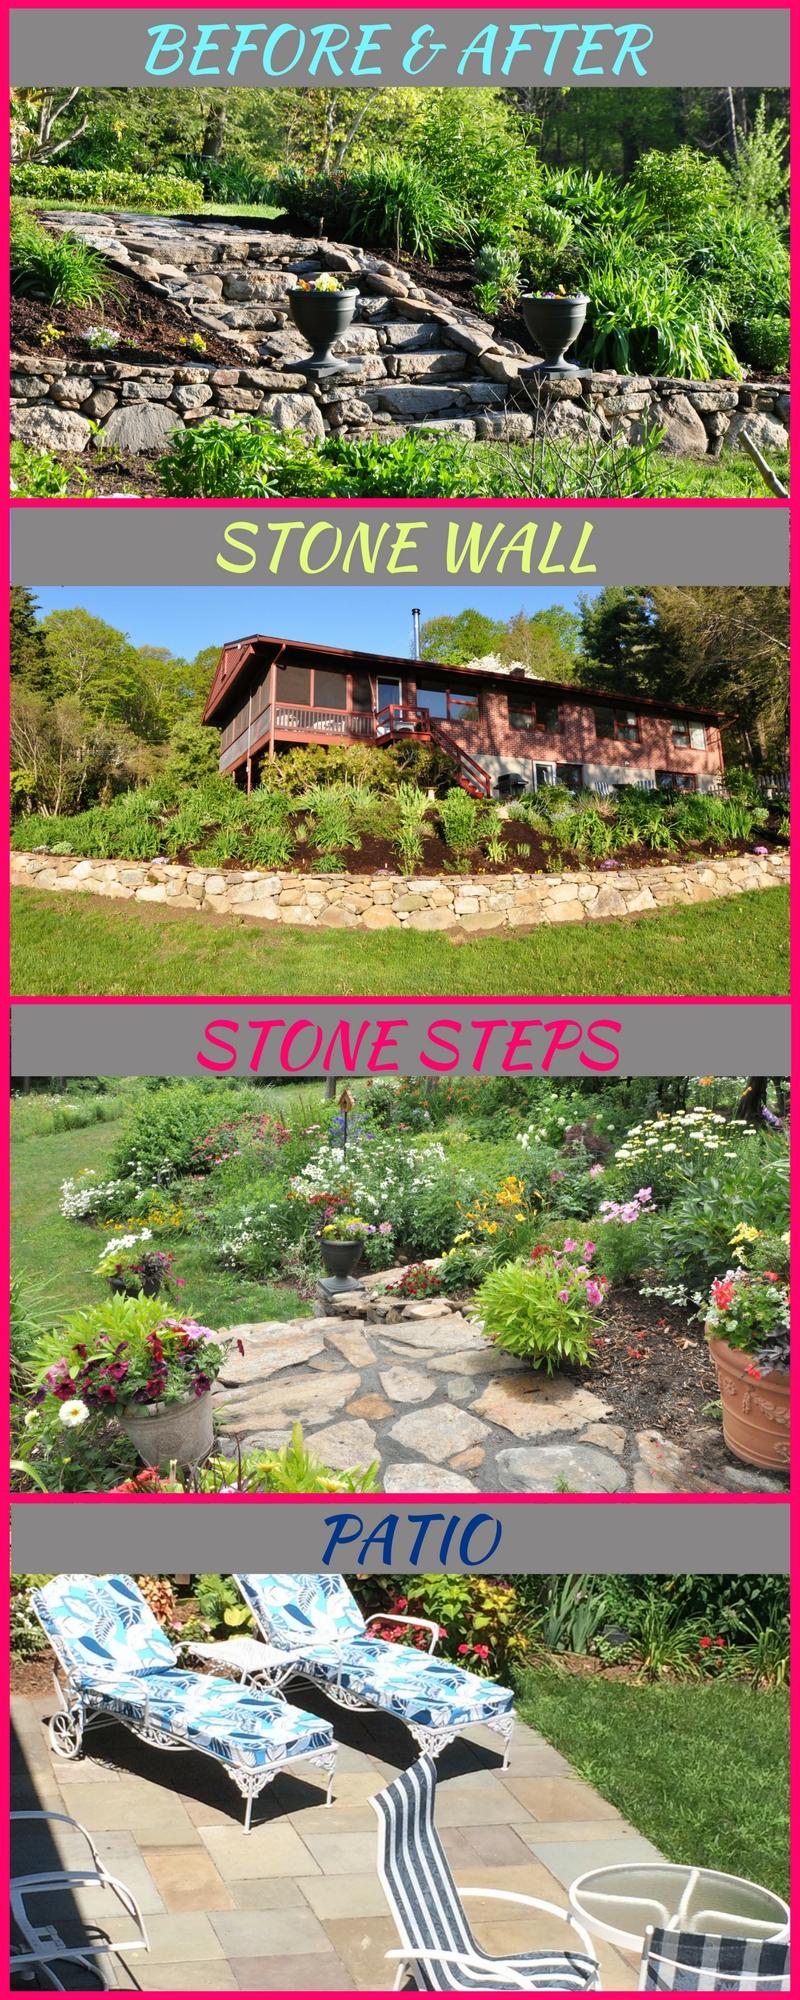 Landscape Design Part 2 Side Yard Stone Steps Before and